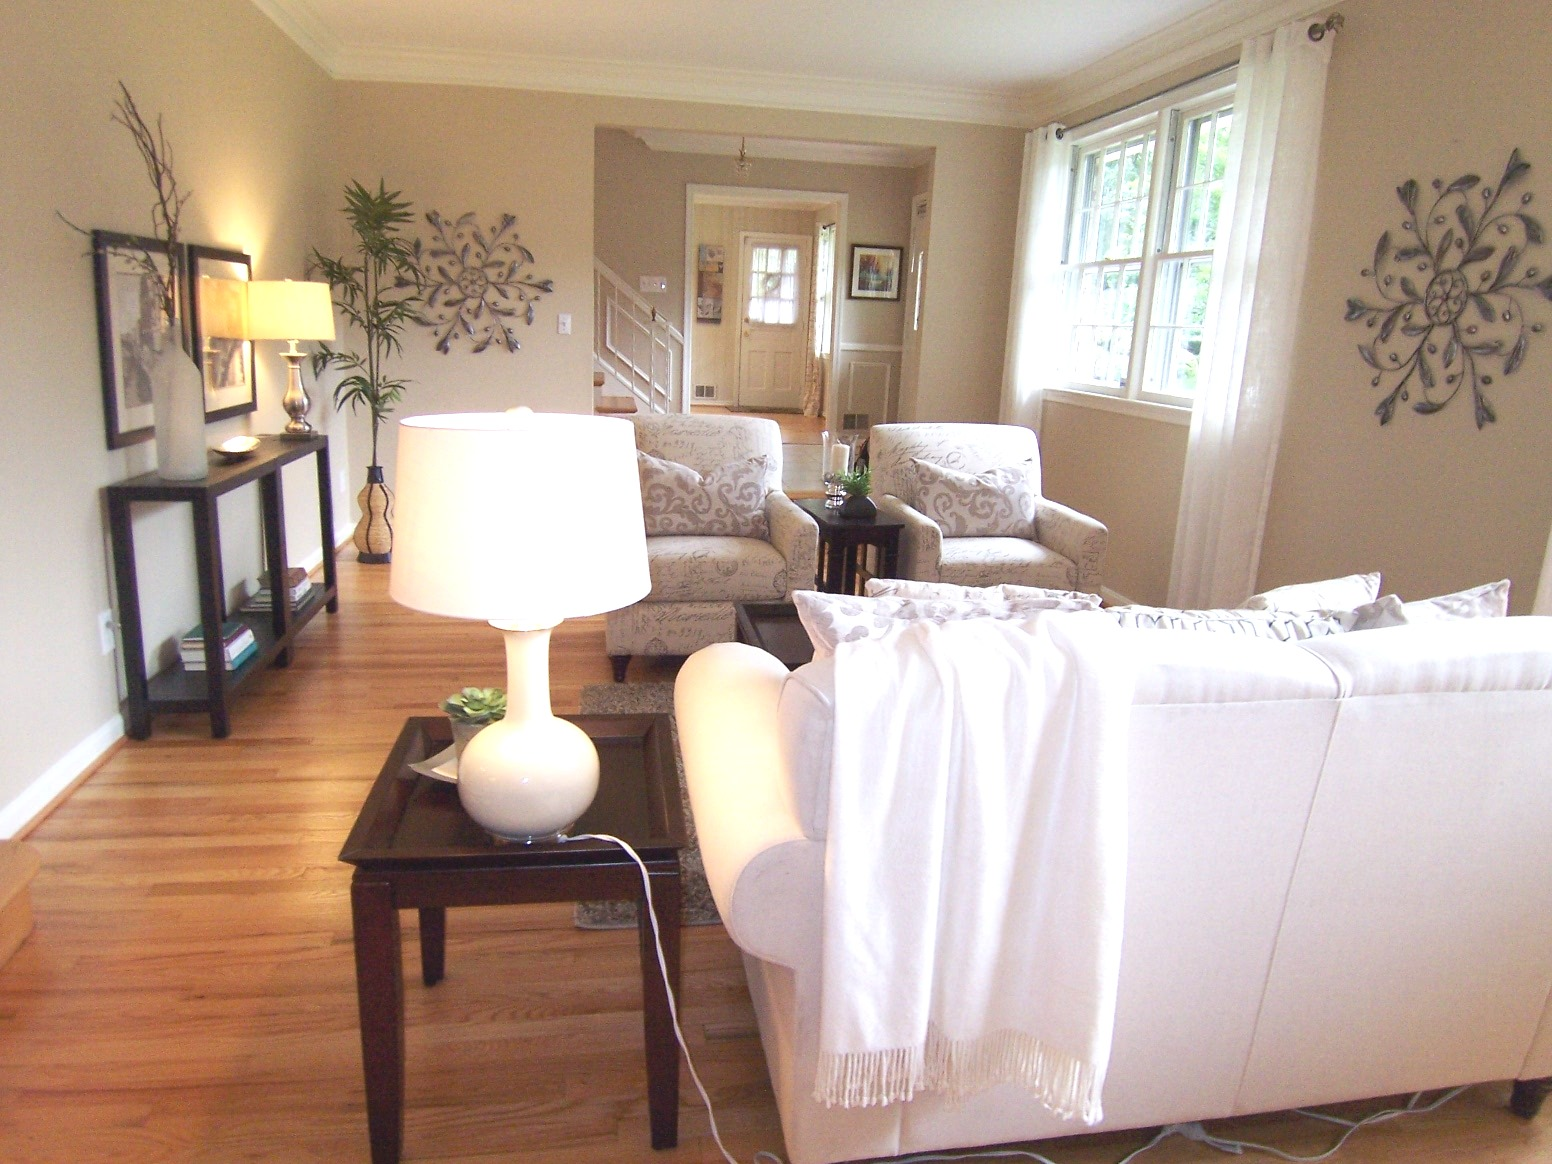 Convento Living Room 3.JPG